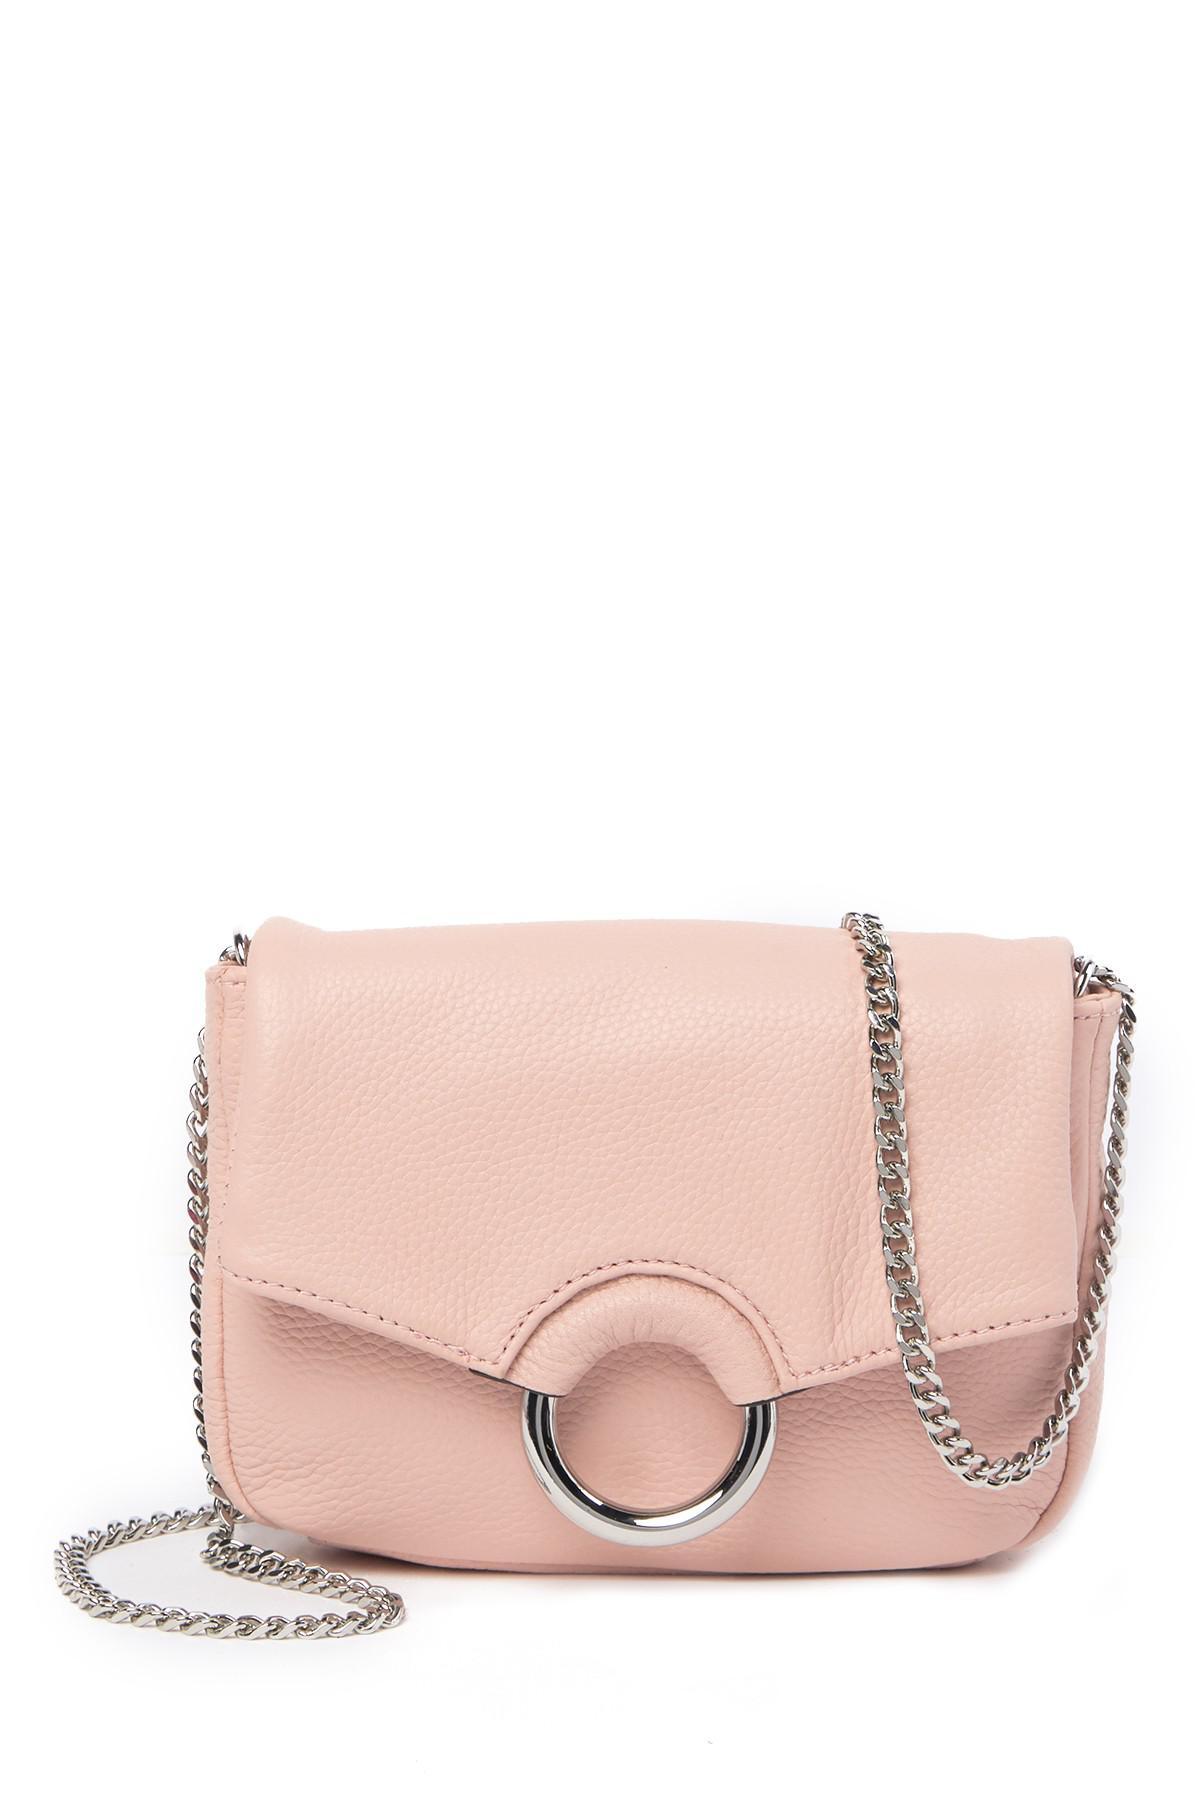 3cadfbaa77c1 Vince Camuto. Women s Adina Small Leather Crossbody Bag